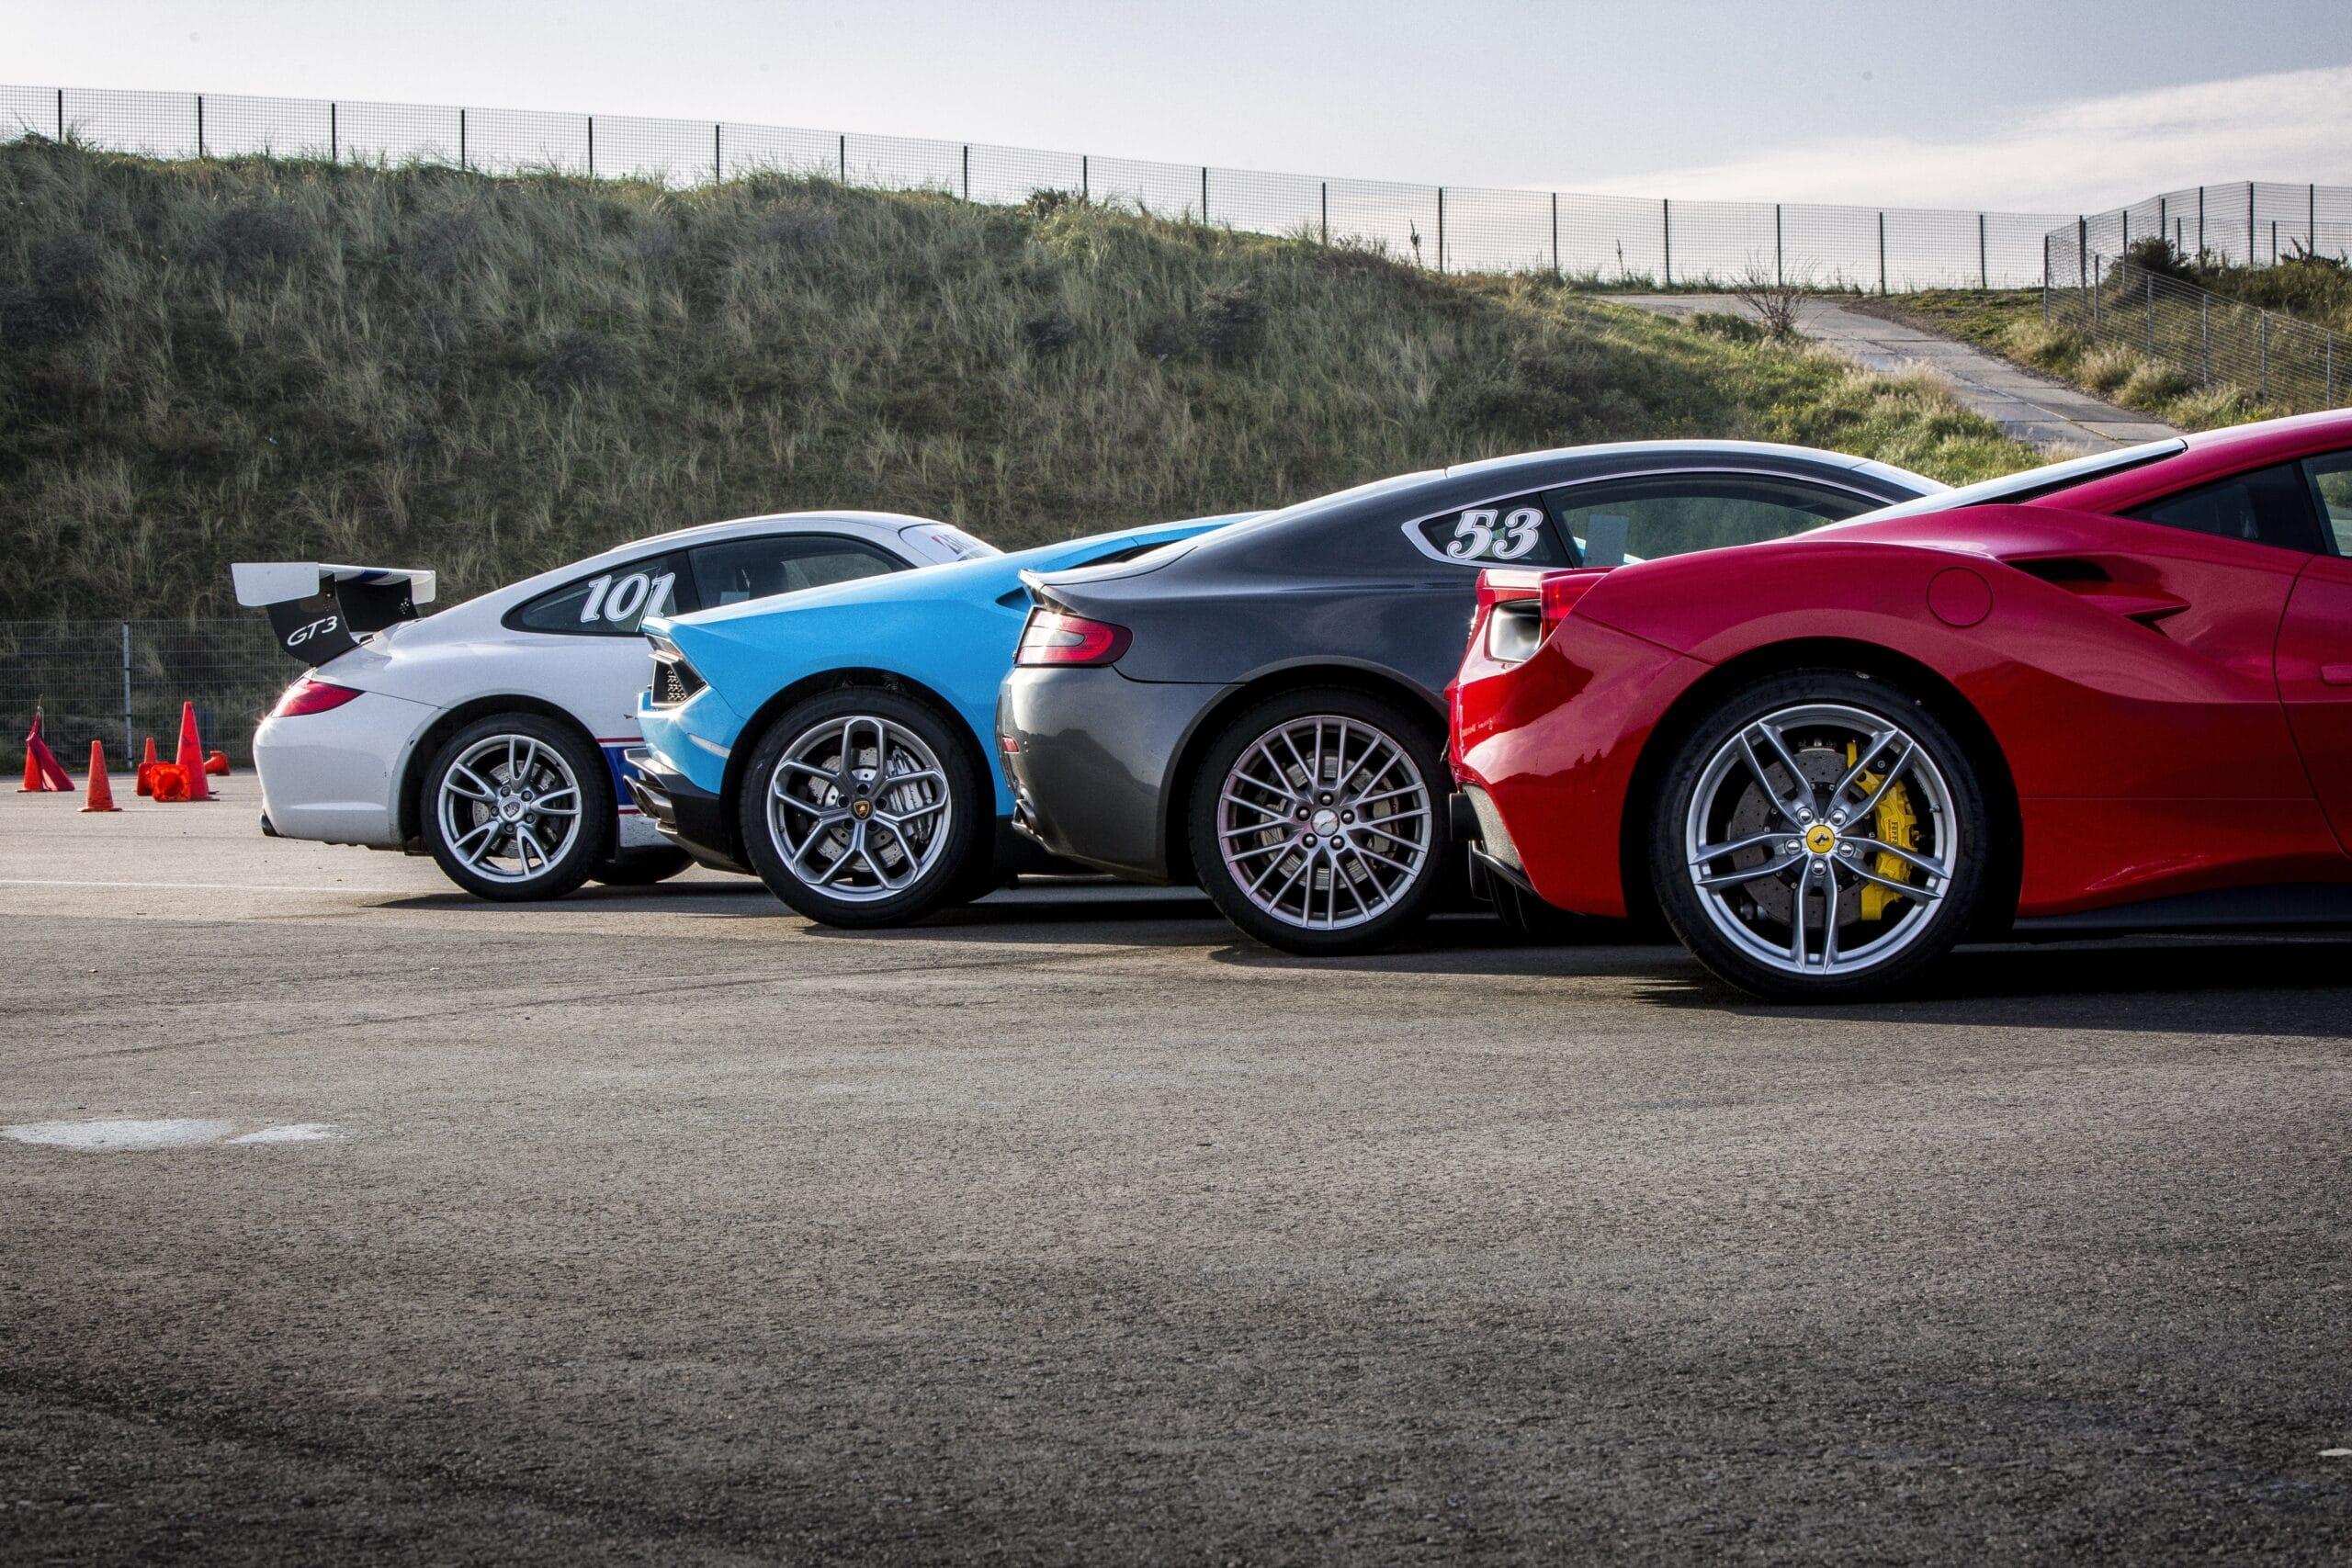 Ferrari 488 GTB, Aston Martin V8 Vantage en Lamborghini Huracan op Circuit Zandvoort als onderdeel van de Race Planet Gold Experience.